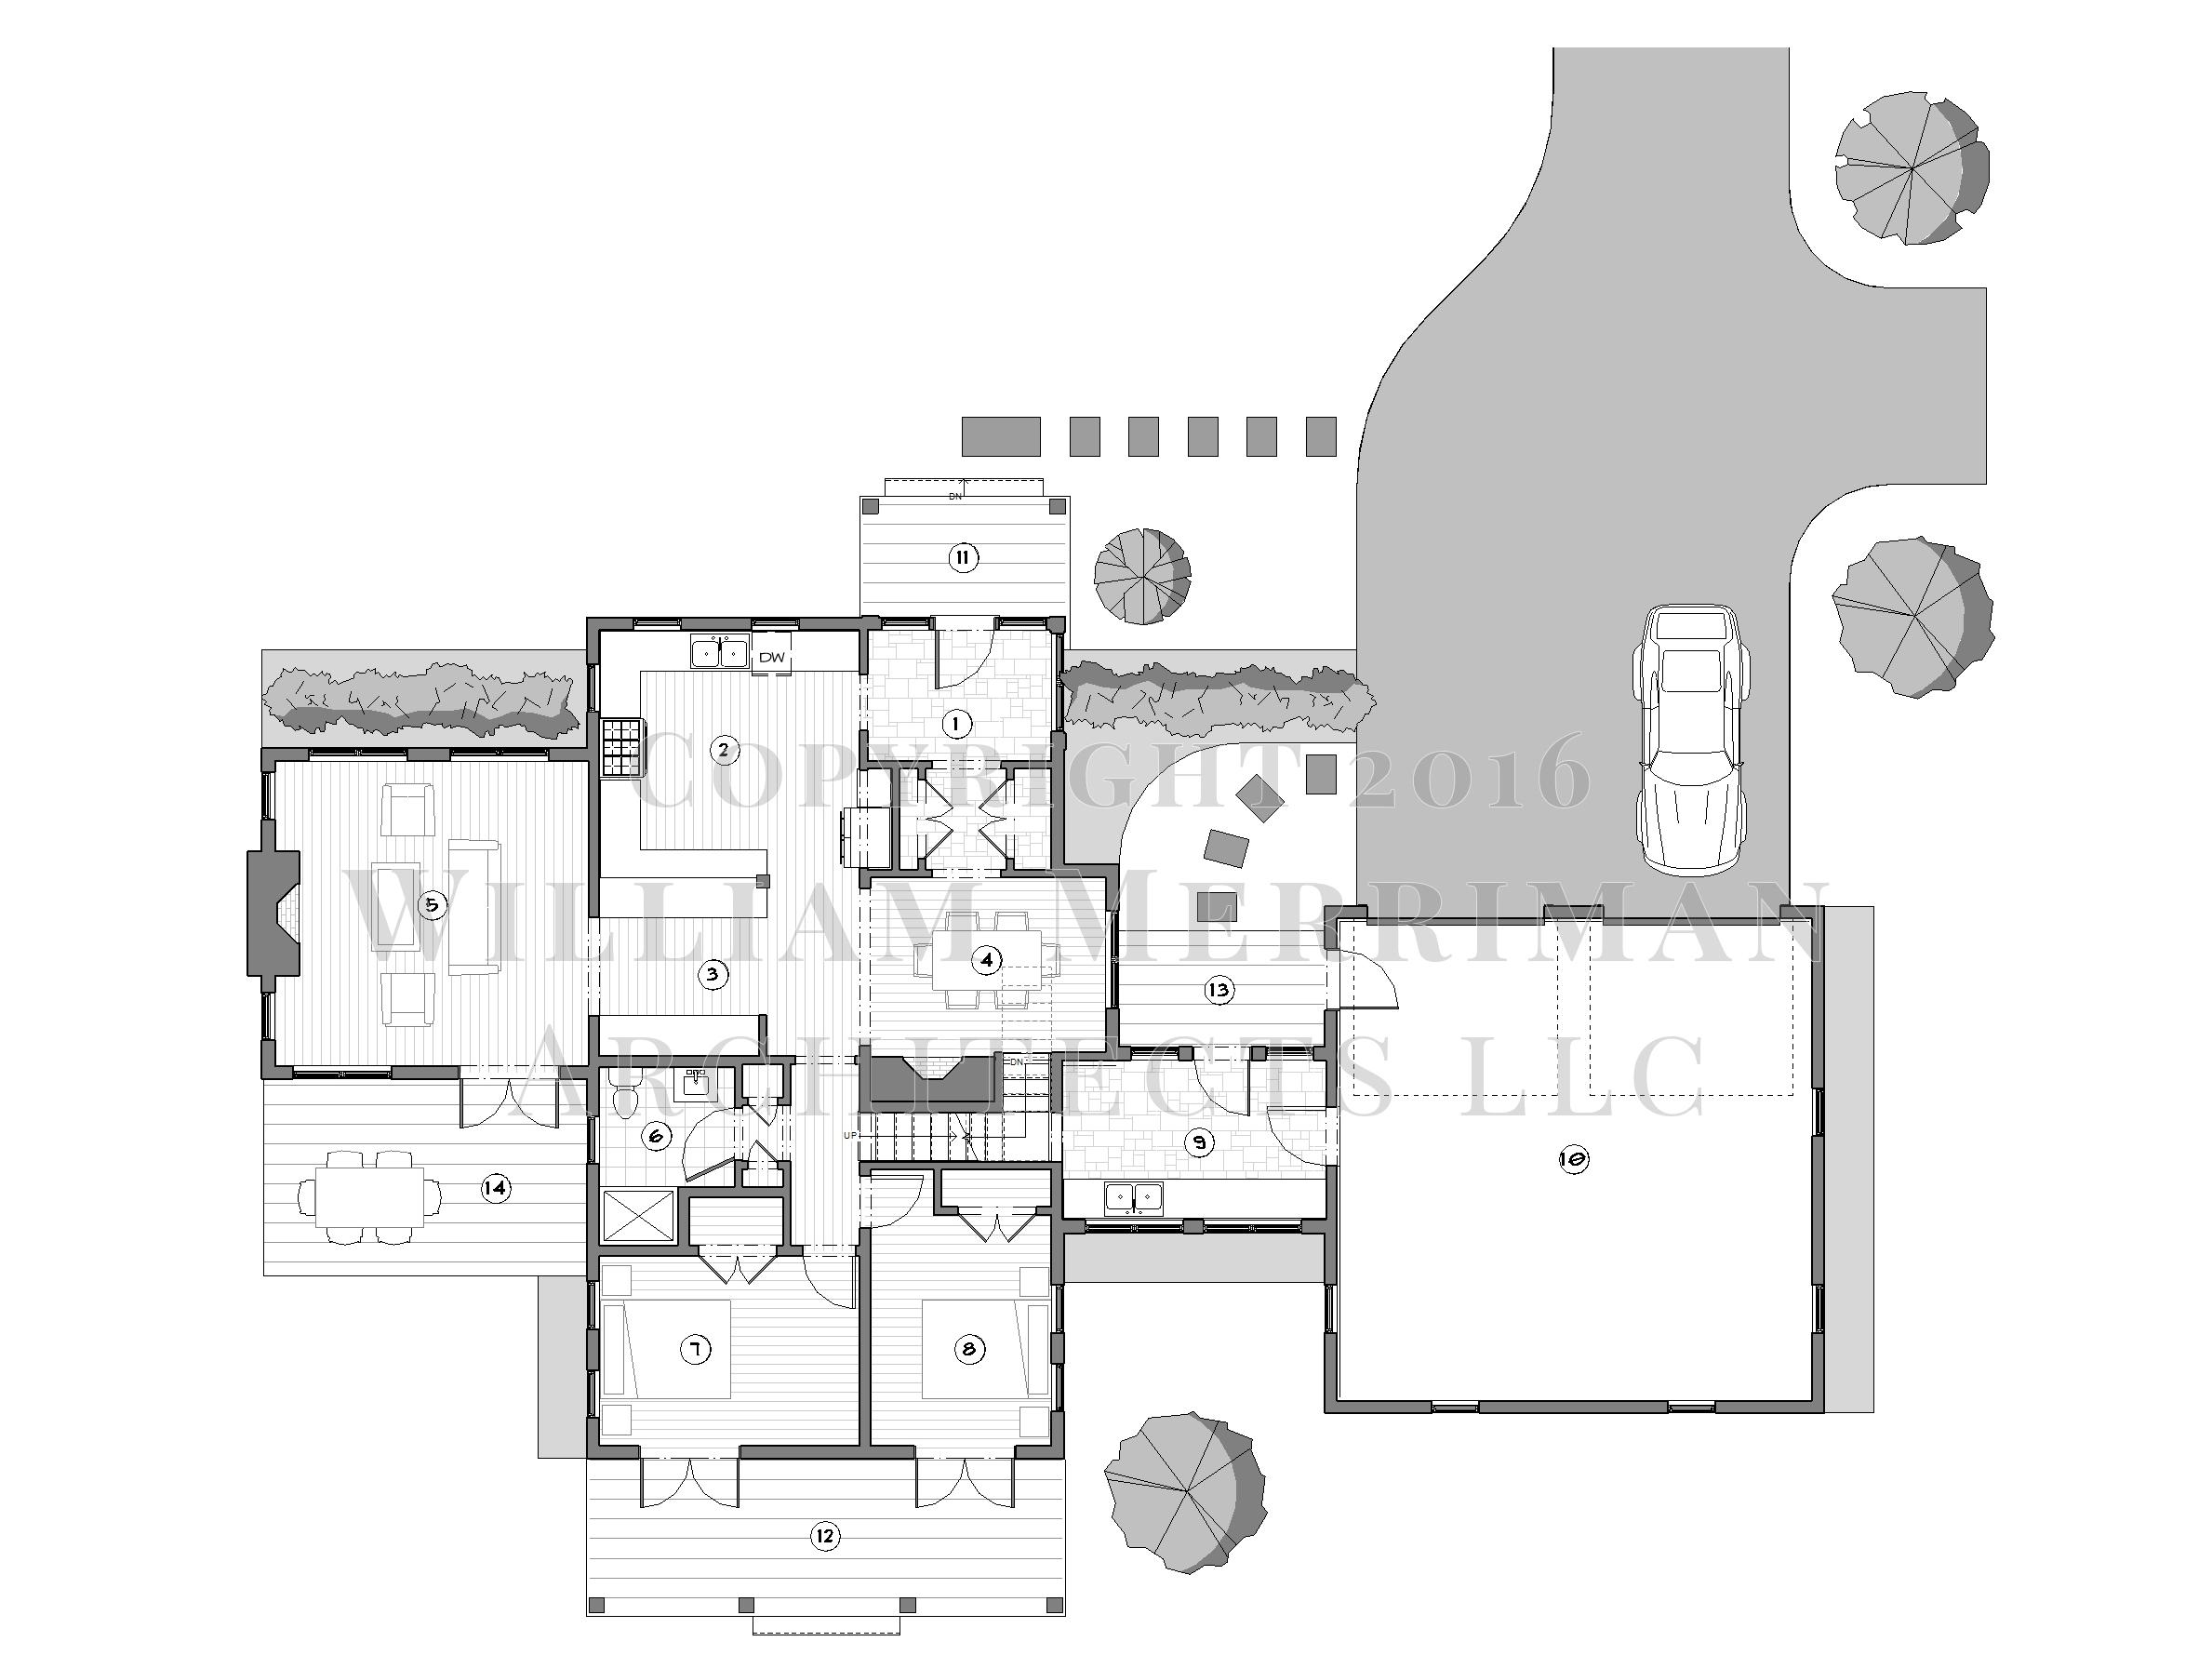 Small Home-2 Plan 1 web.jpg